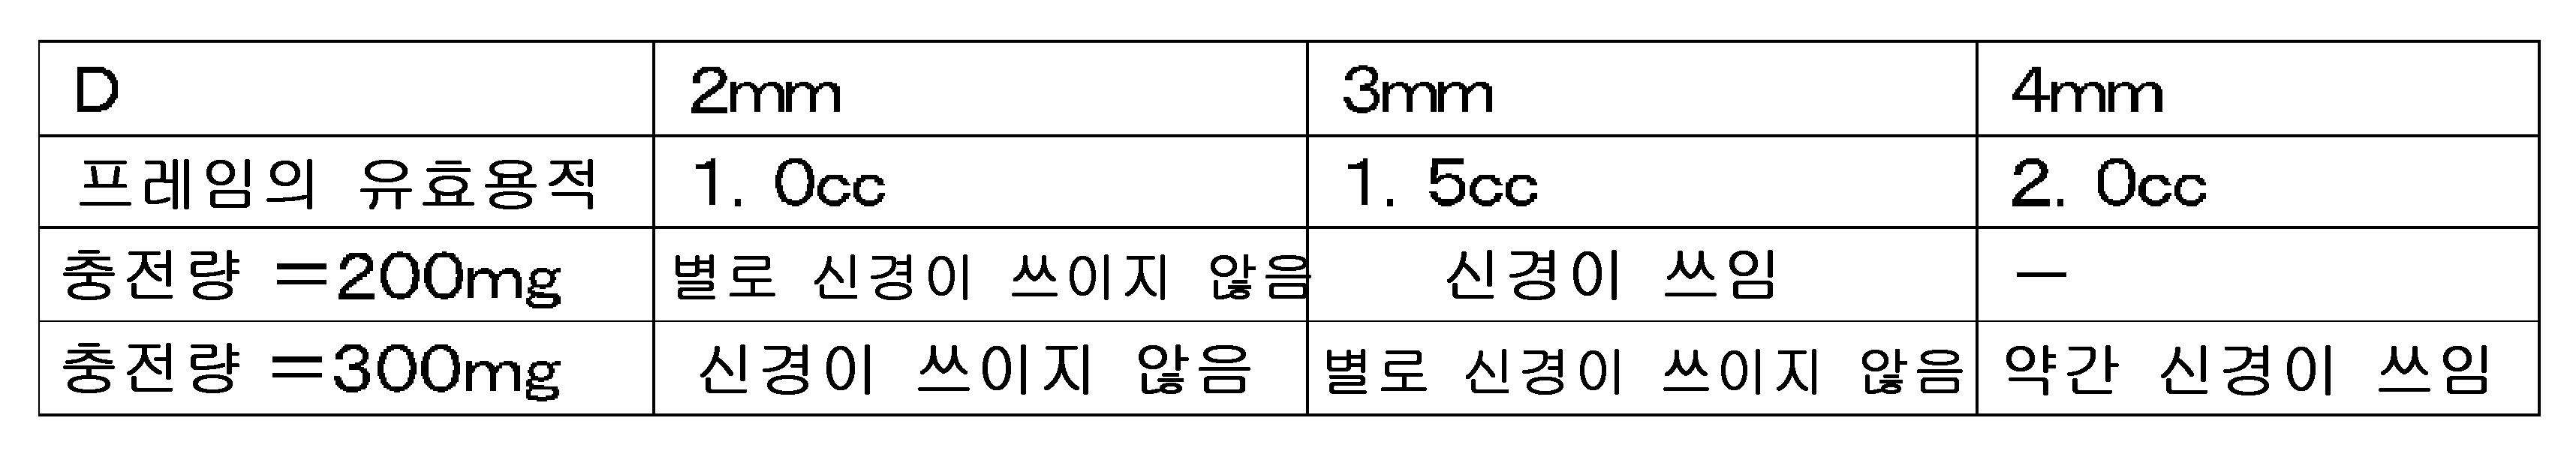 Figure 112013008922470-pct00001